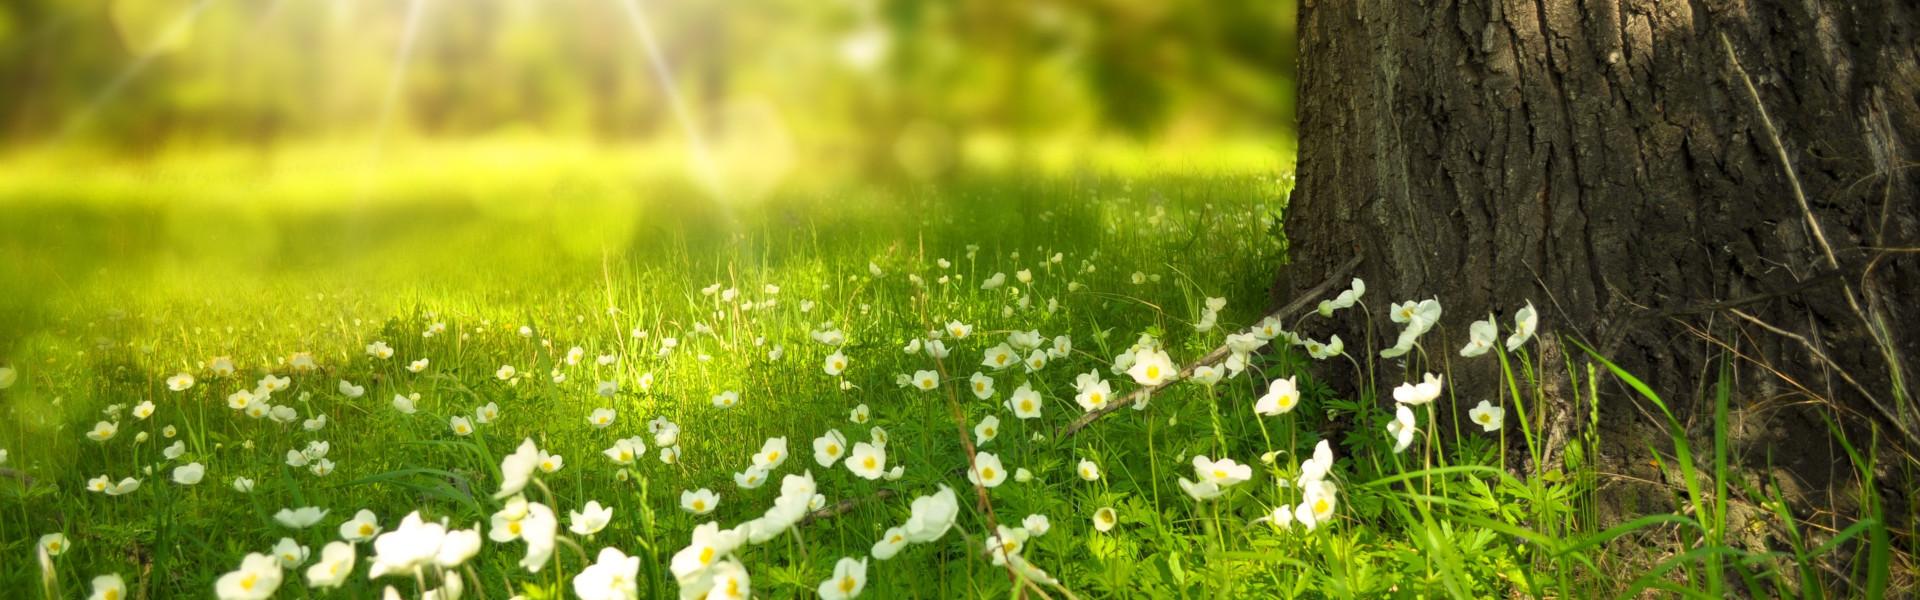 Bloemen grasveld